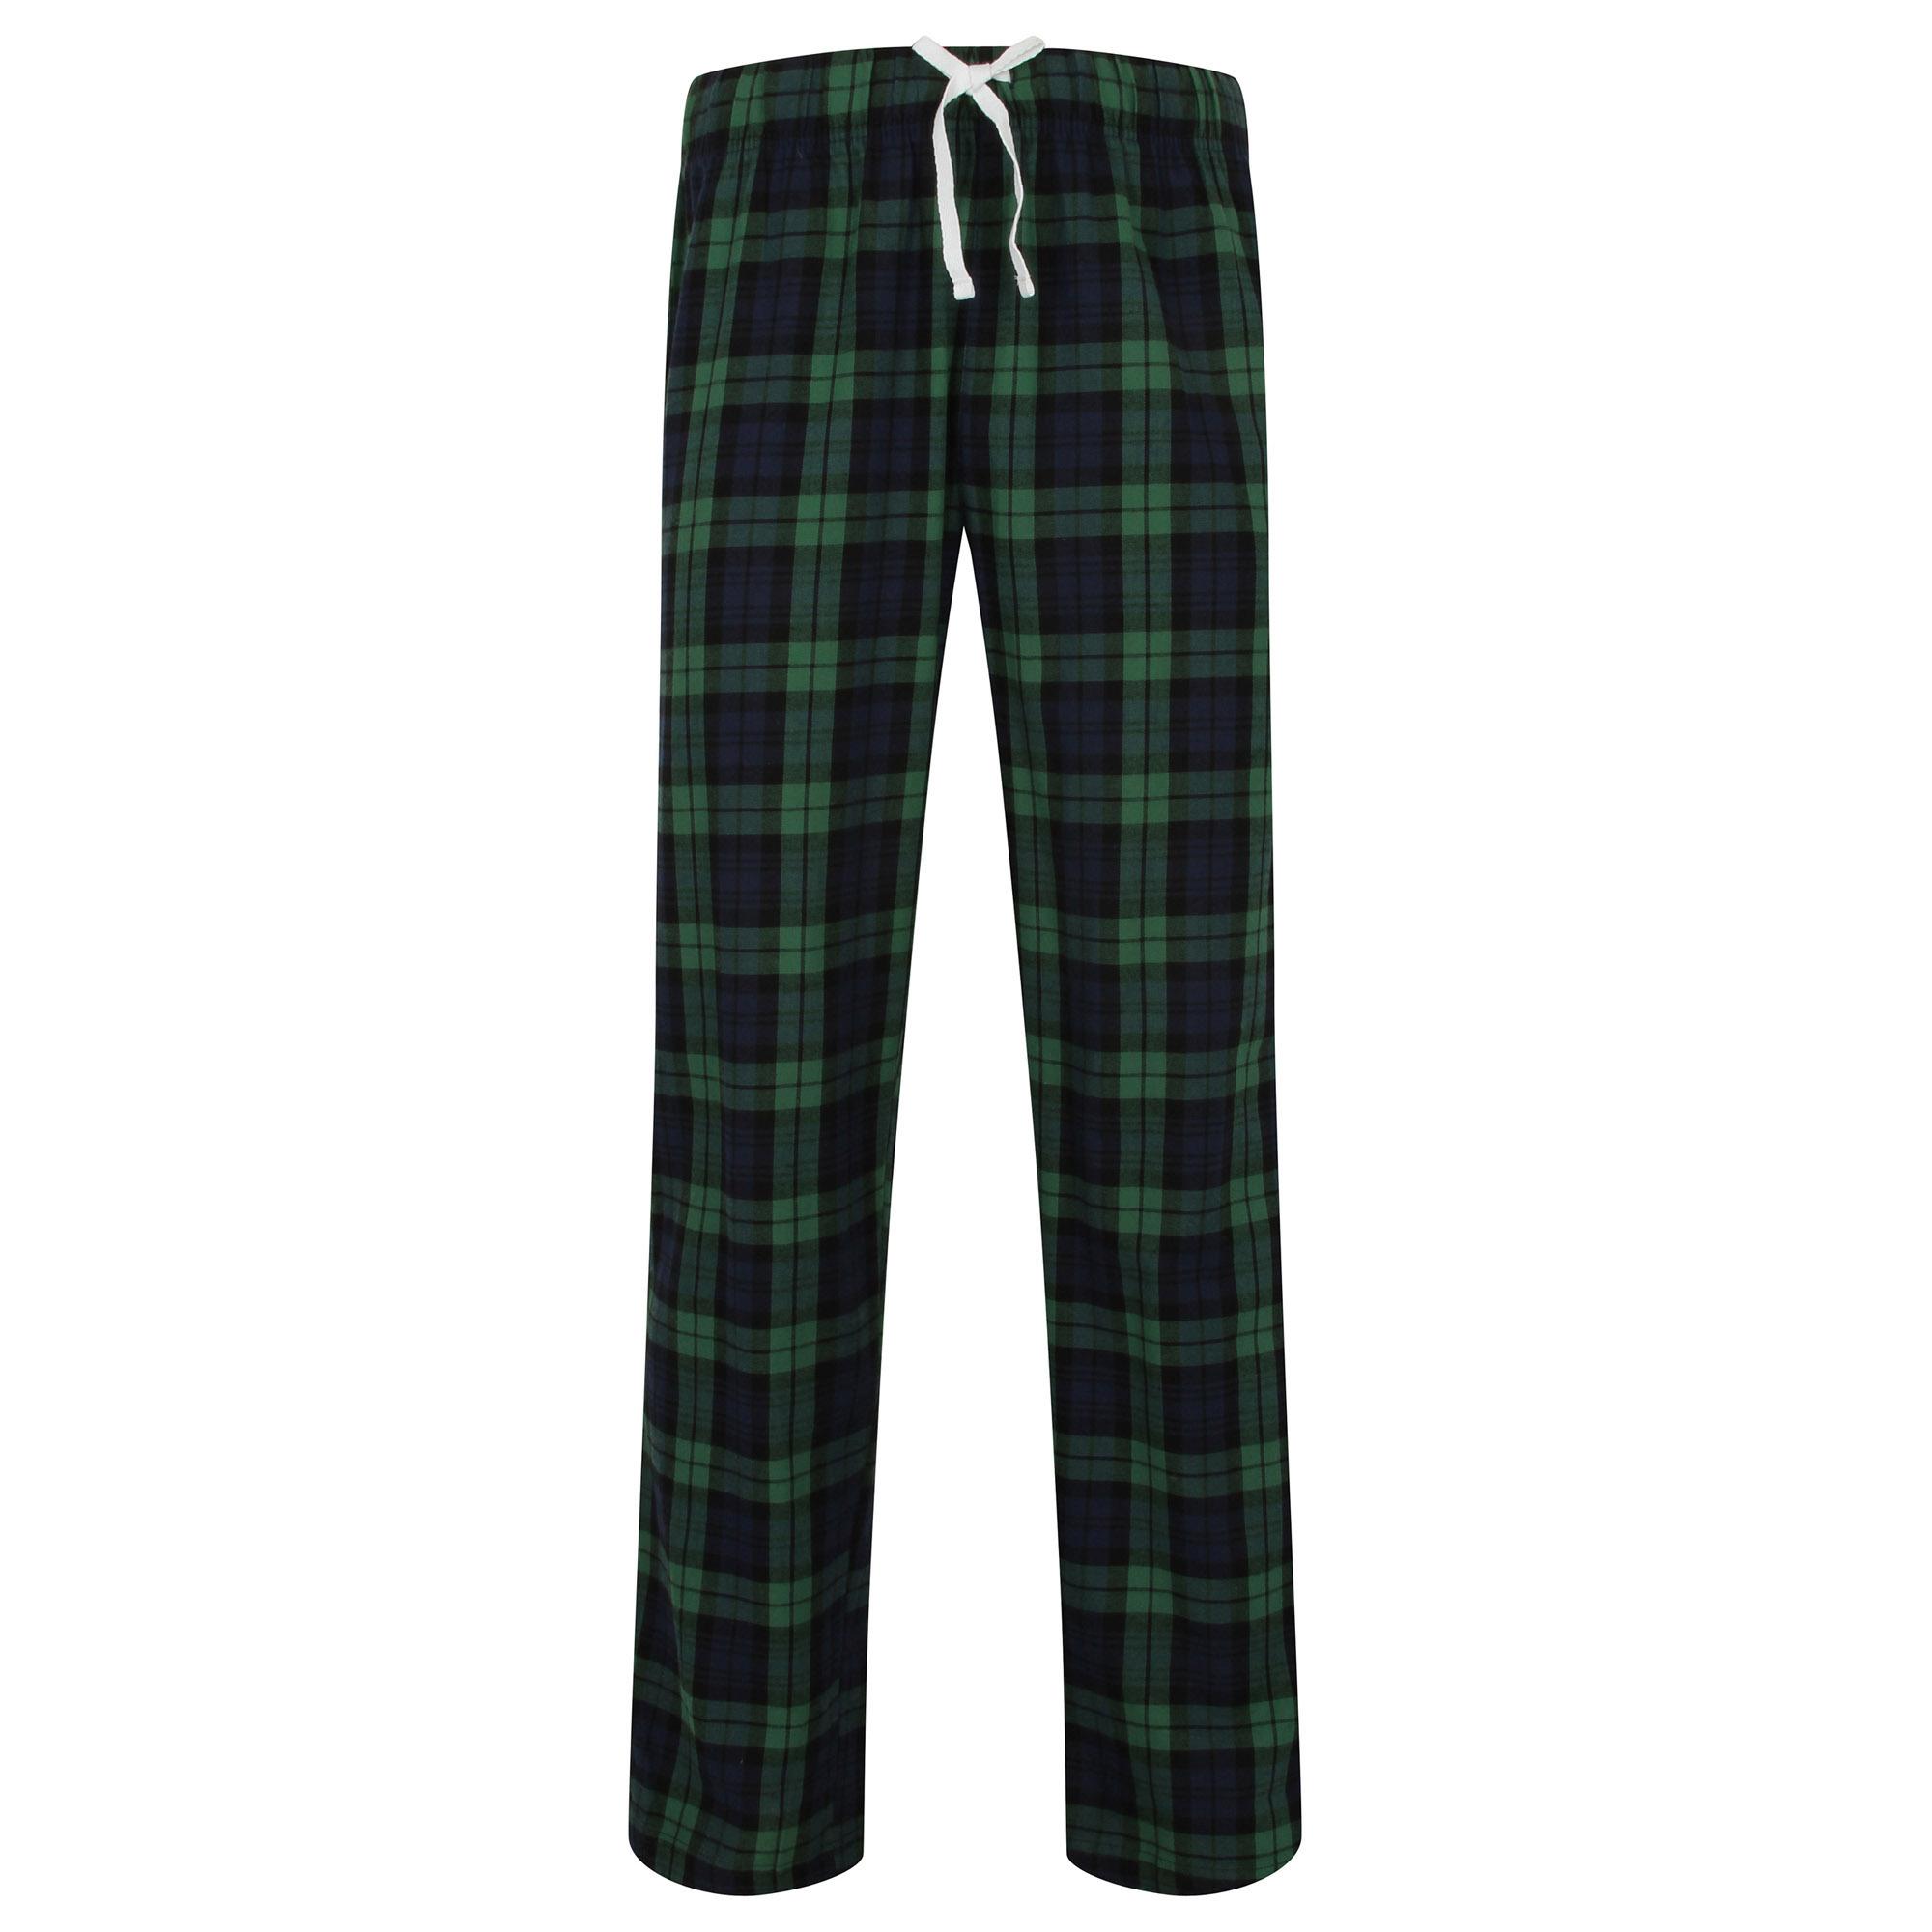 Skinnifit Mens Tartan Lounge Pants (S) (Navy/Green Check)